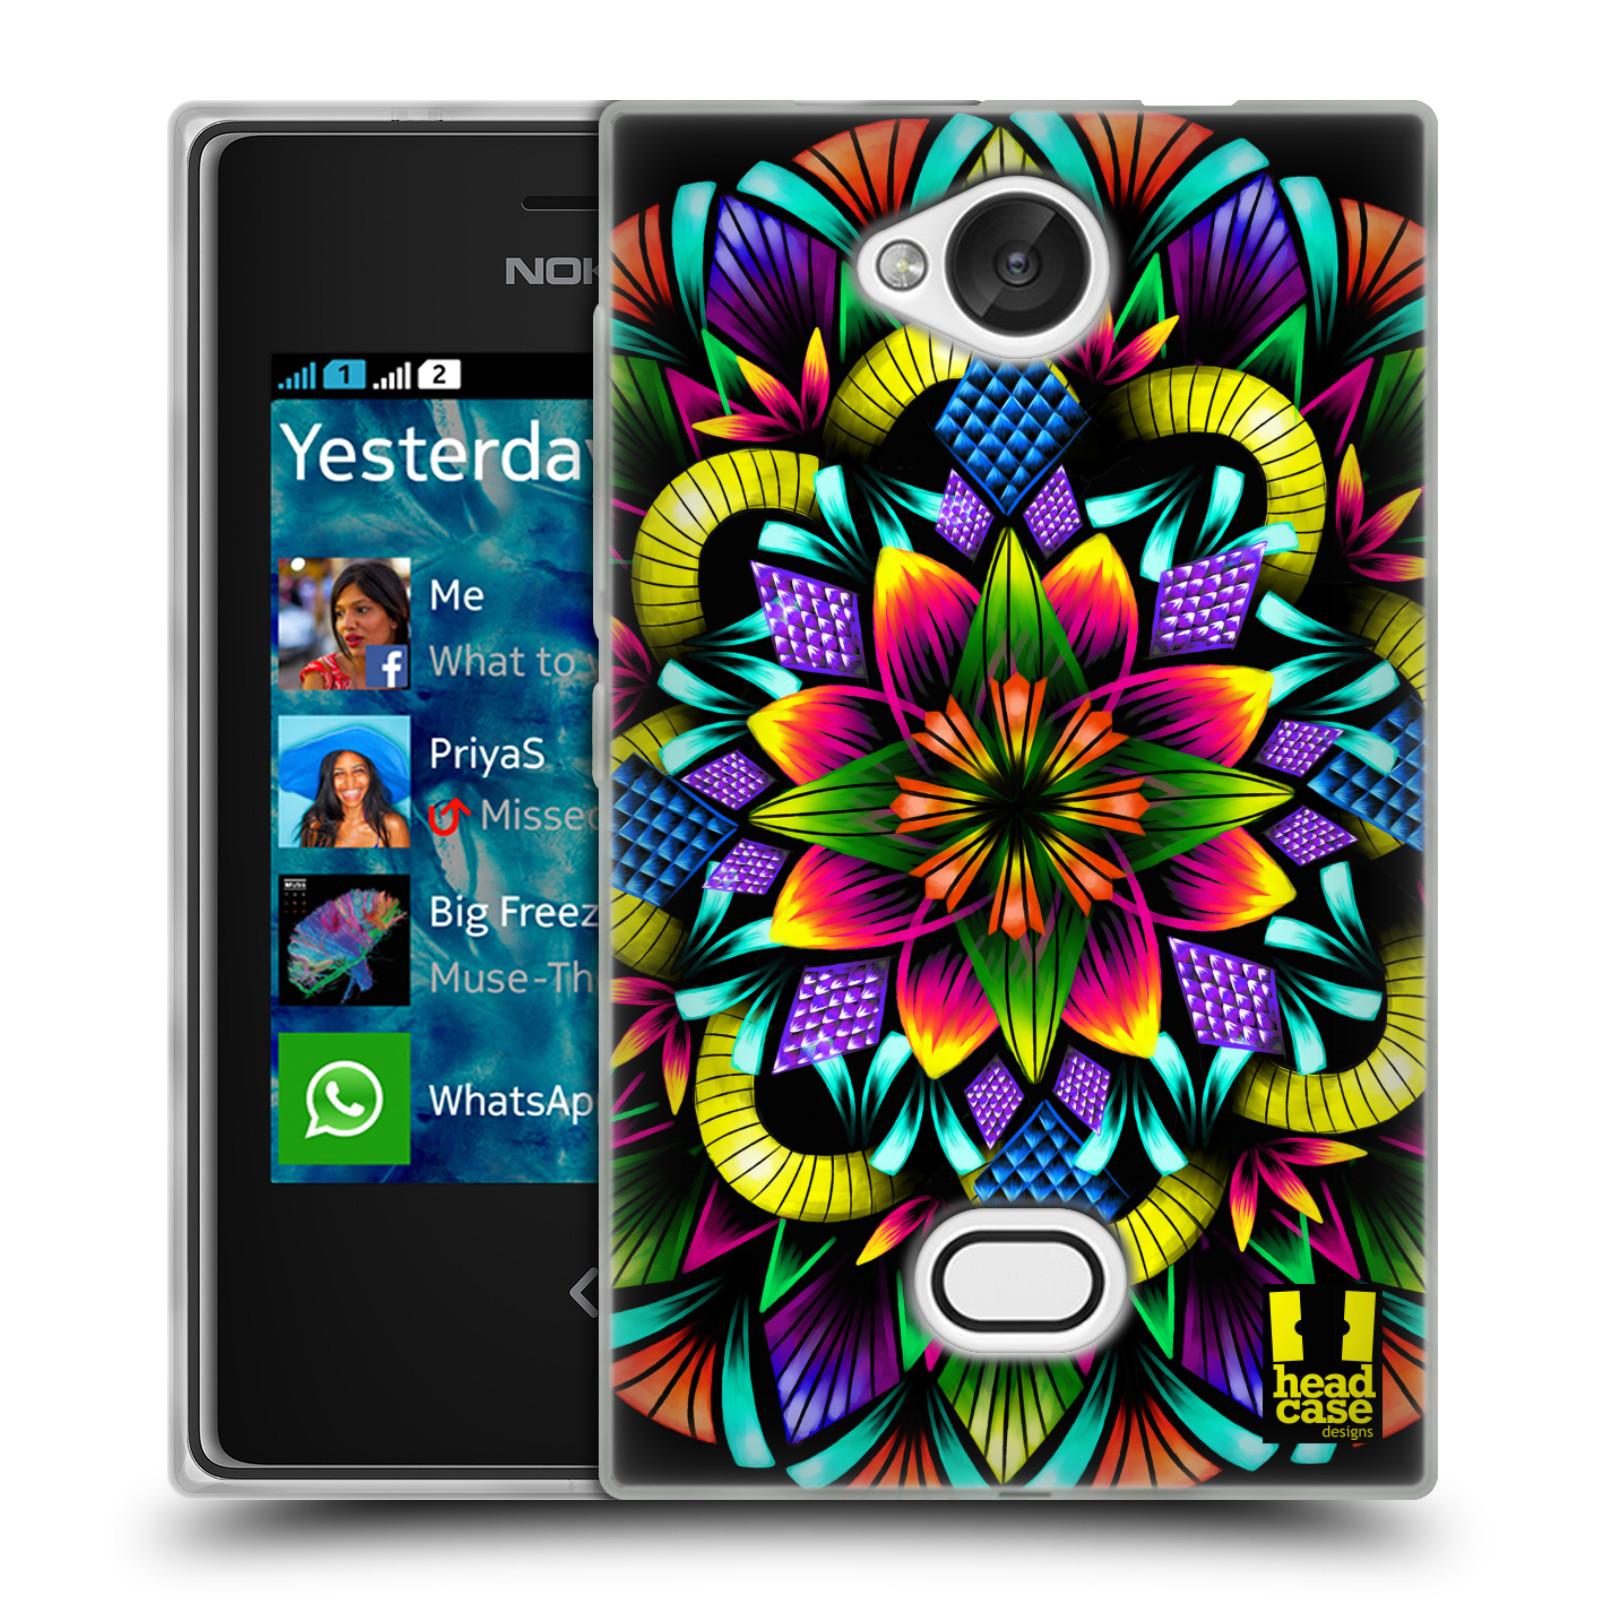 HEAD CASE silikonový obal na mobil NOKIA Asha 503 vzor Indie Mandala kaleidoskop barevný vzor KVĚTINA